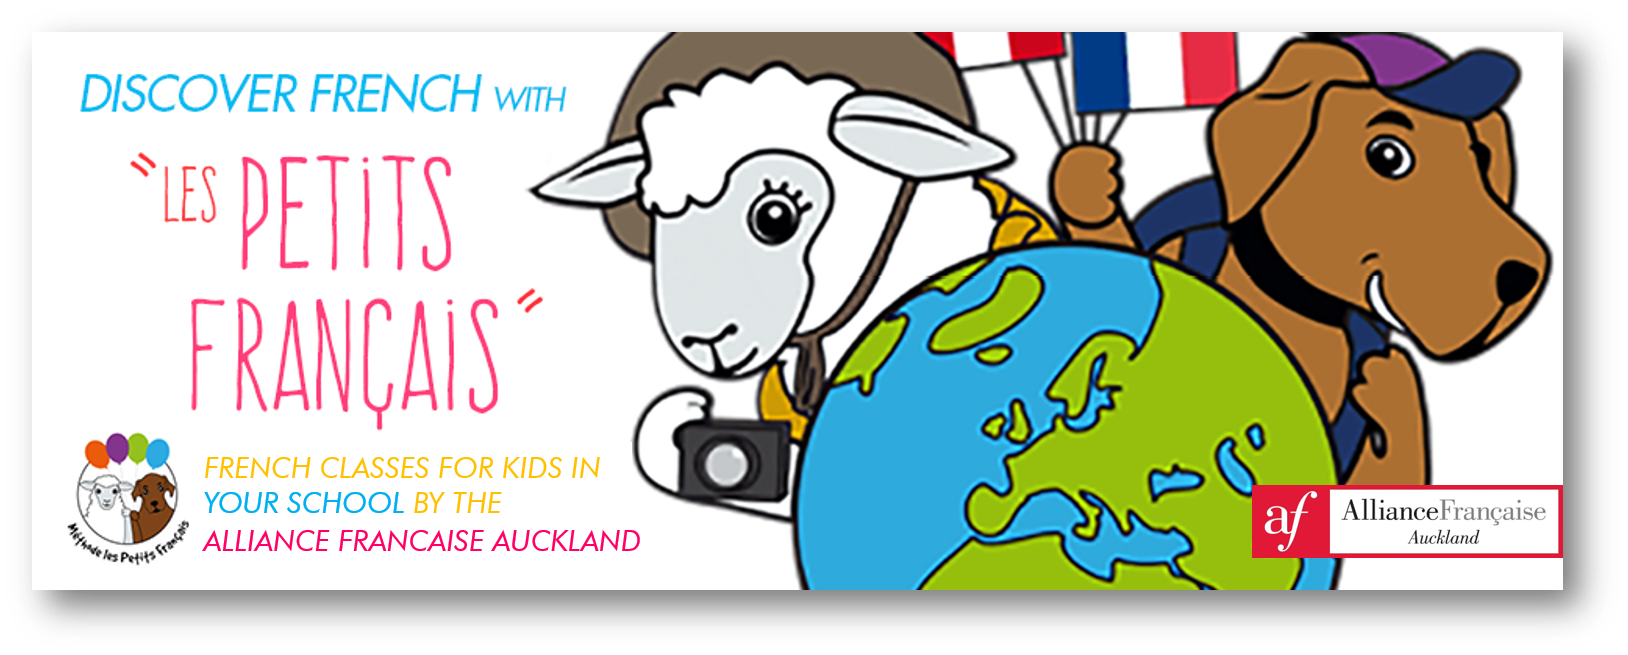 France clipart french school. Alliance francaise auckland children